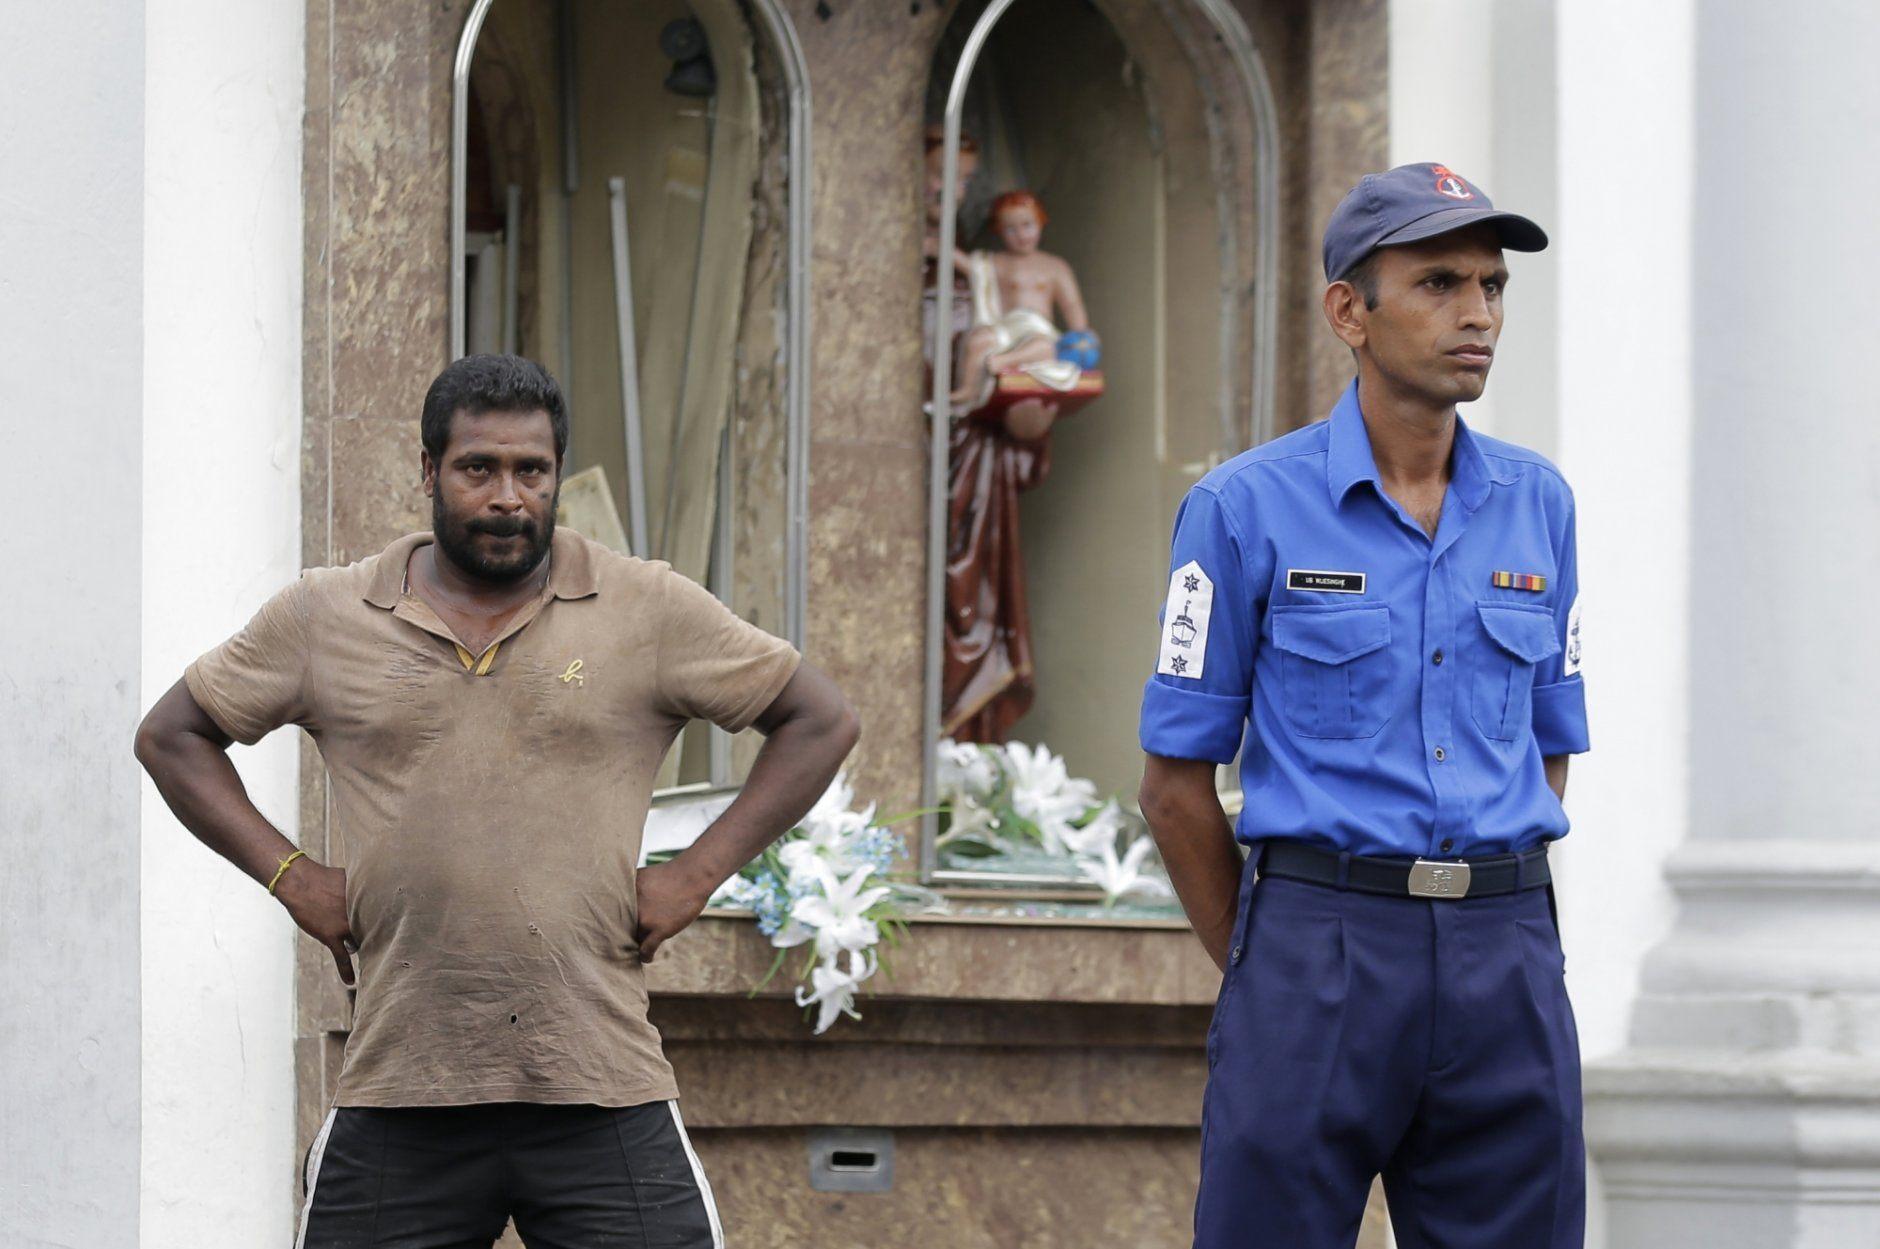 A Sri Lankan police officer and a local stand outside St. Anthony's Shrine where a blast happened in Colombo, Sri Lanka, Sunday, April 21, 2019. A Sri Lanka hospital spokesman says several blasts on Easter Sunday have killed dozens of people. (AP Photo/Eranga Jayawardena)